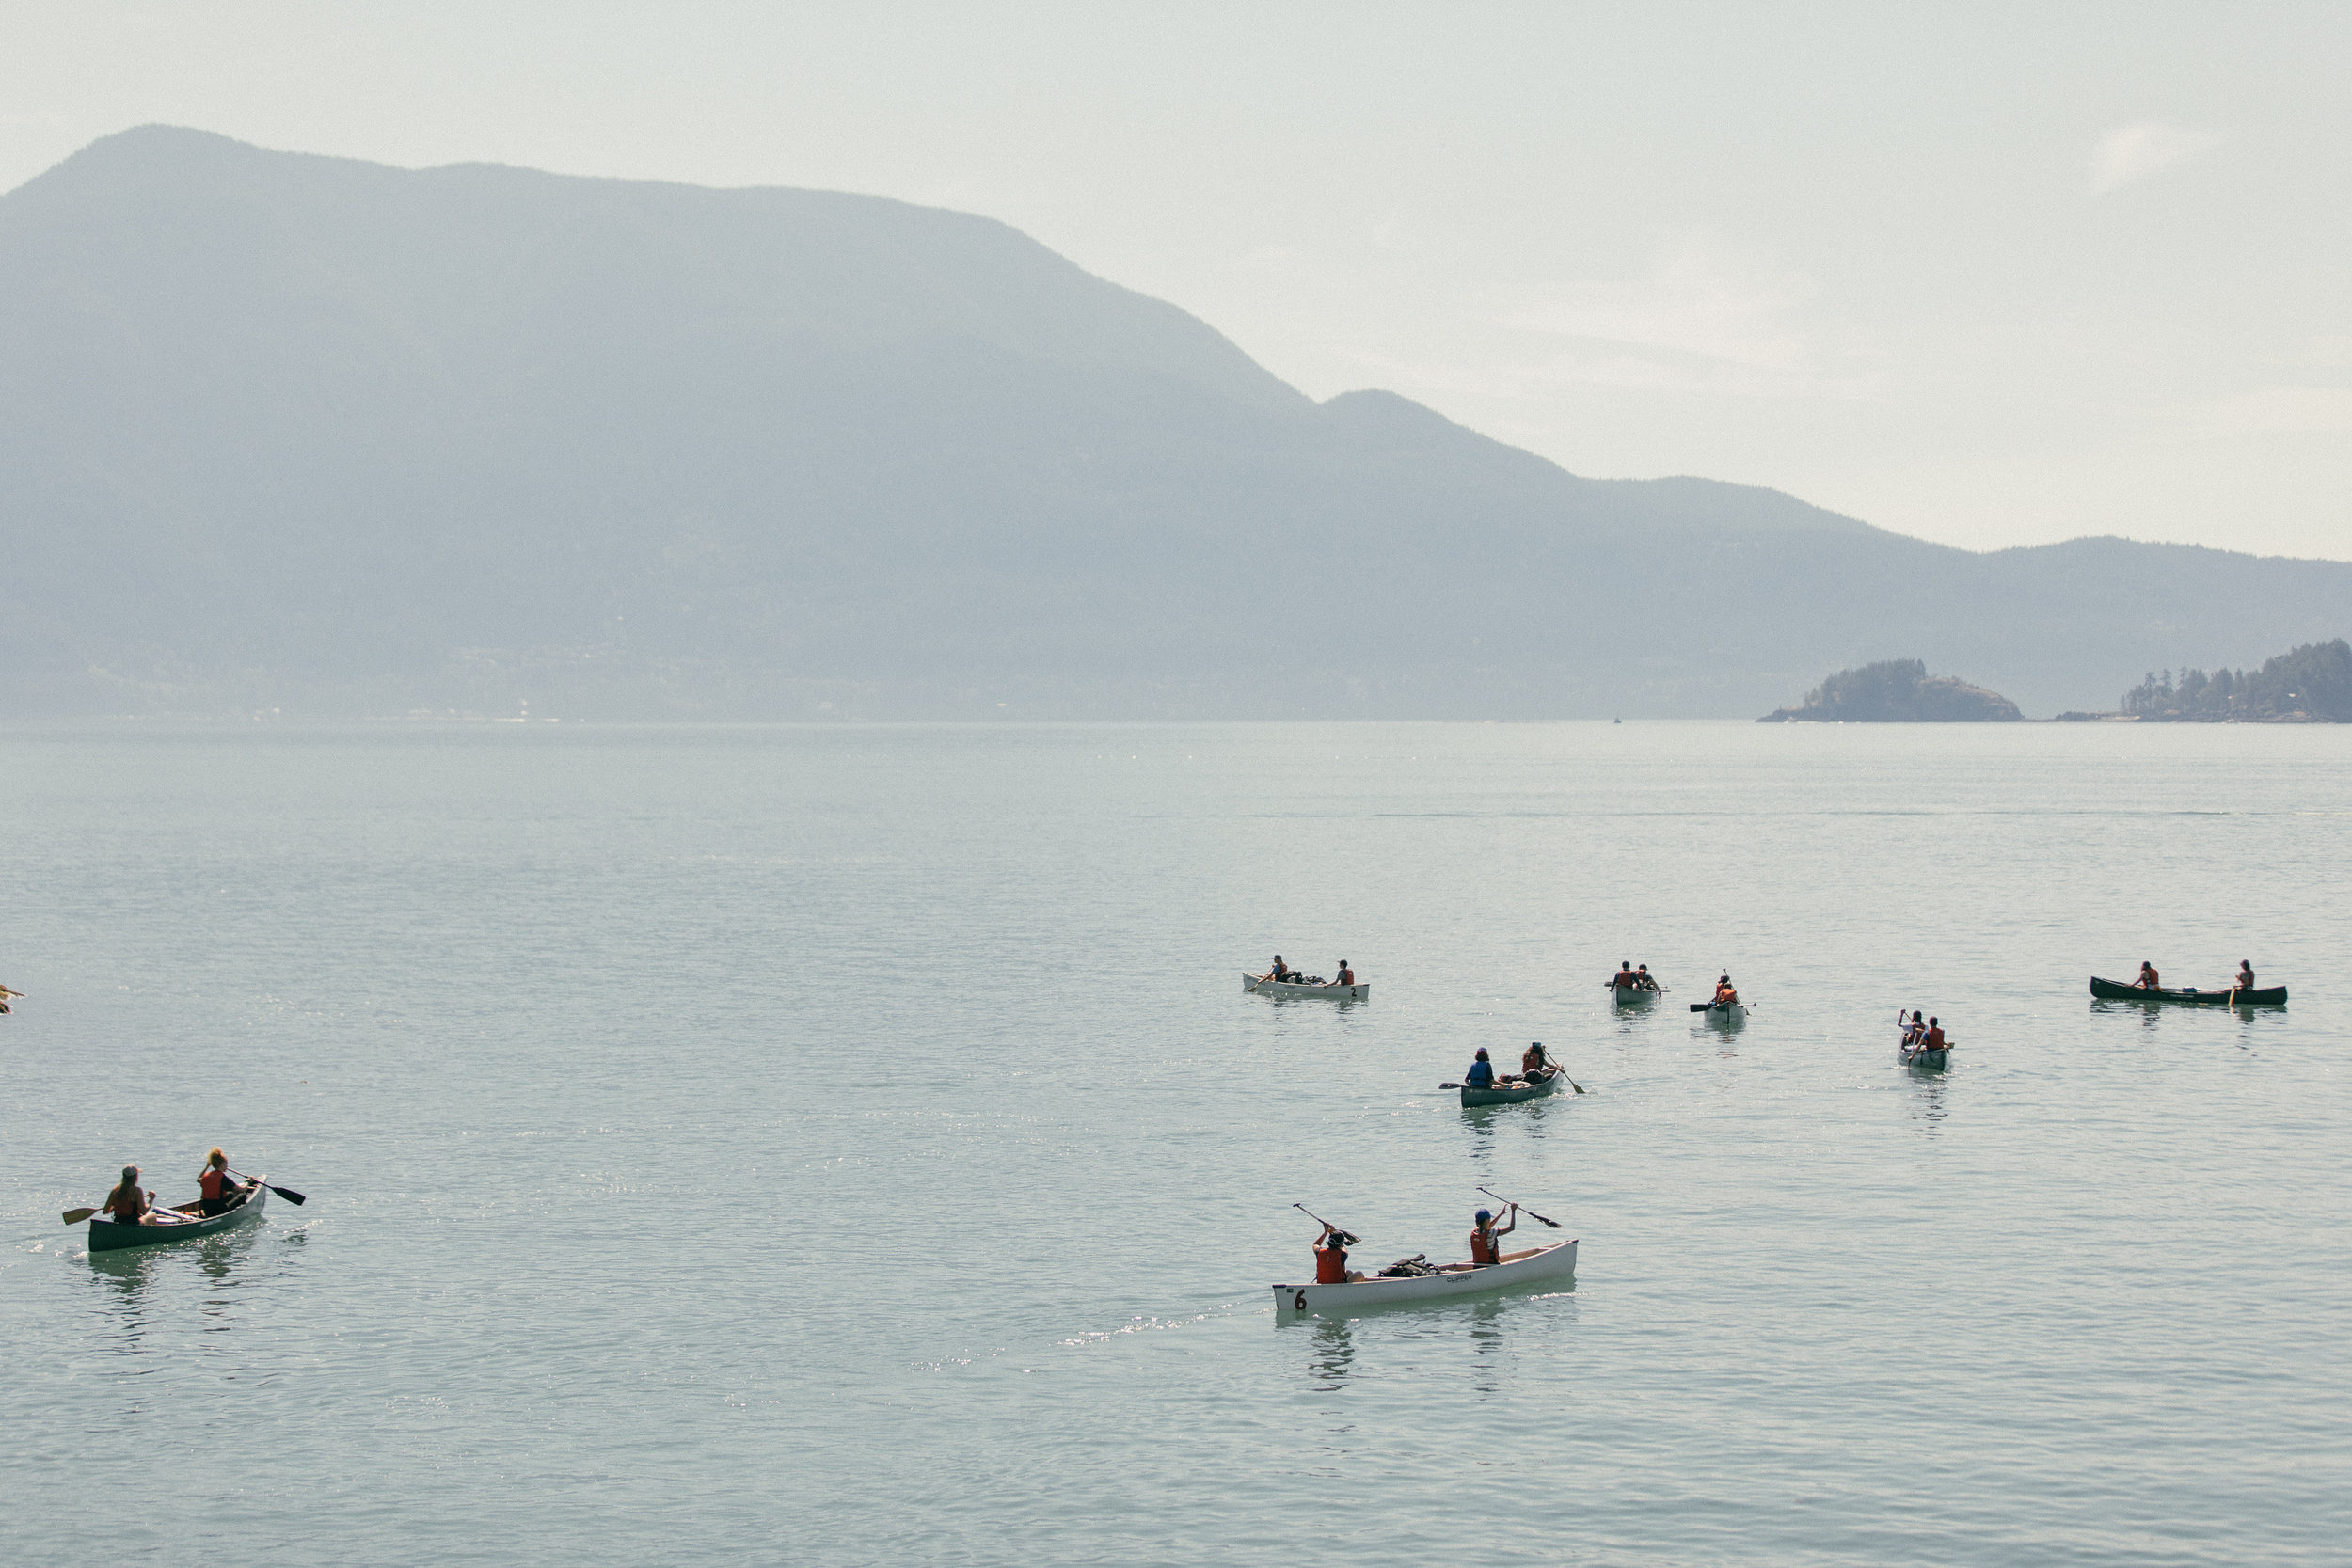 Summer Camp_Polaris Canoe_4.jpg